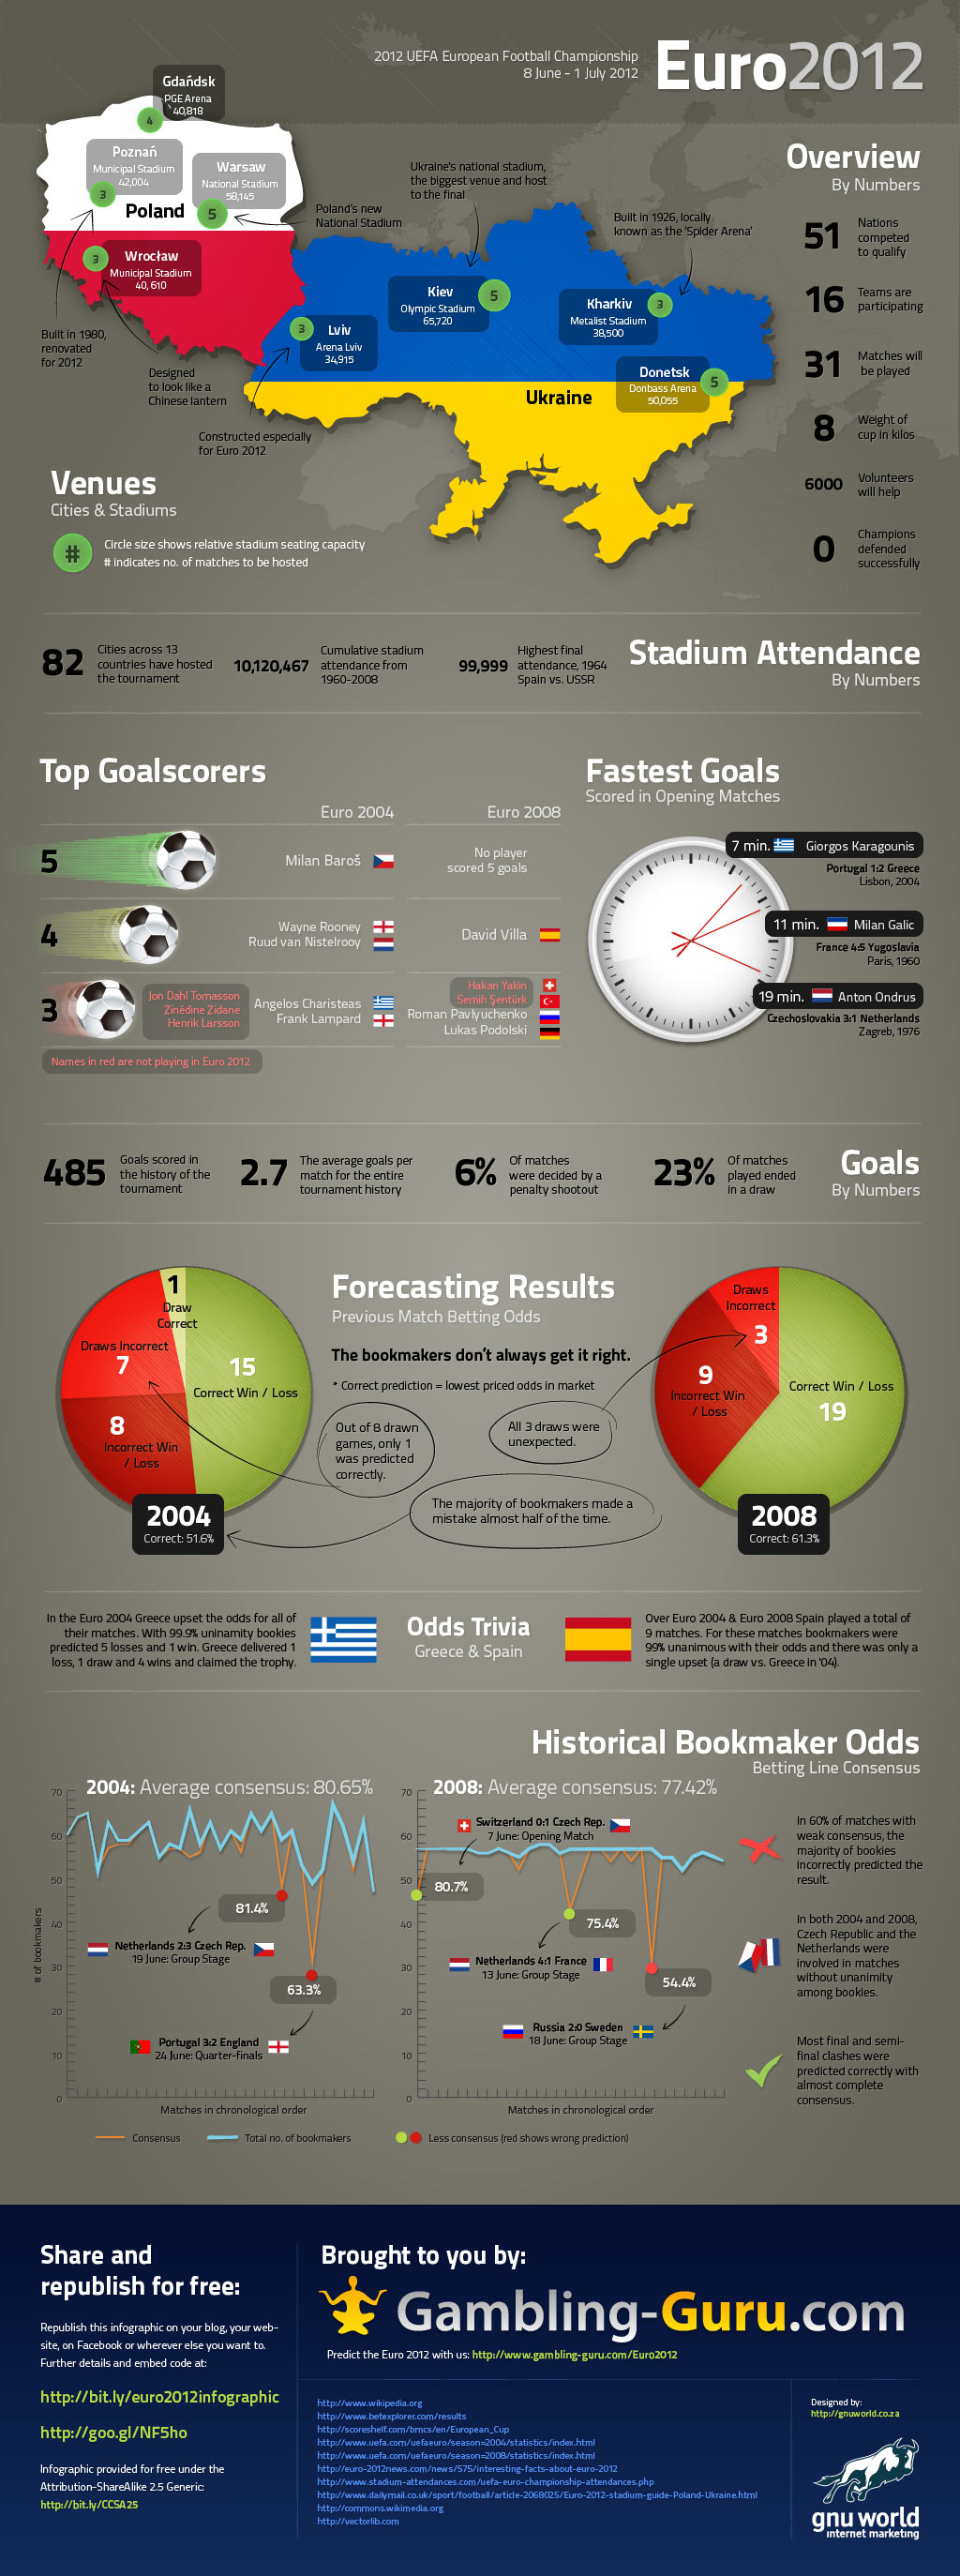 The UEFA Euro Championship